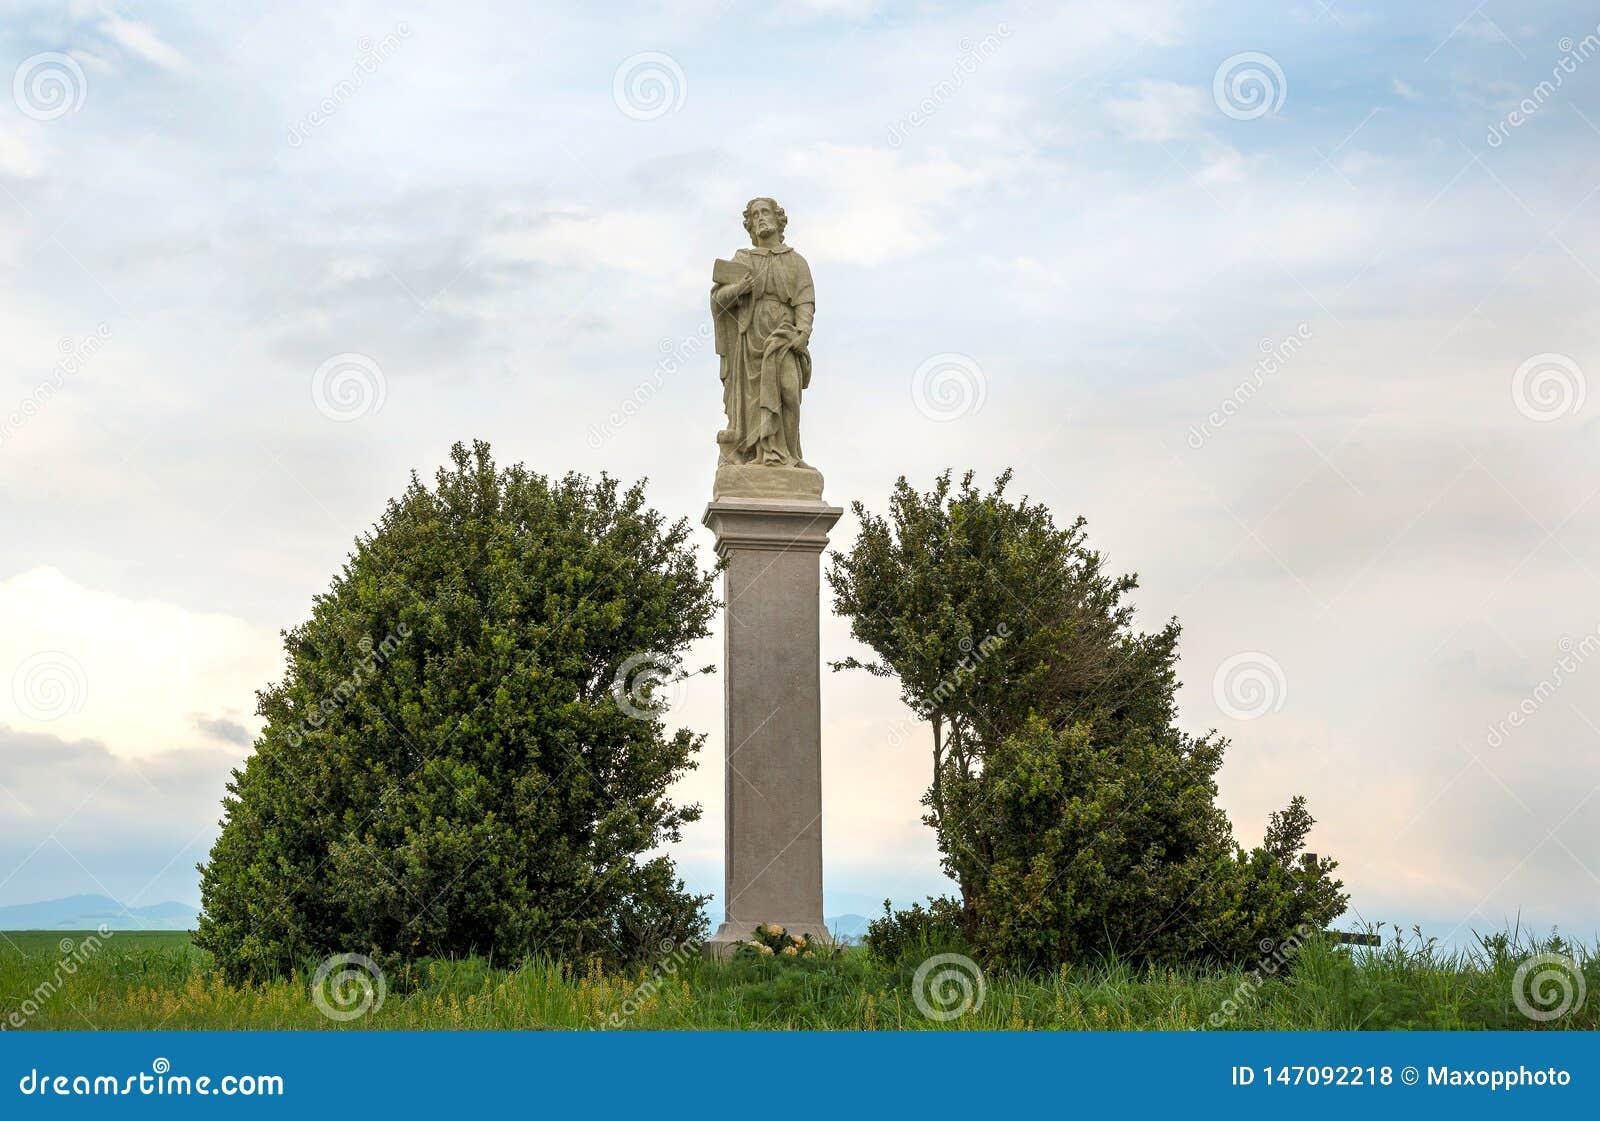 Saint Roch or Rocco statue. Catholic saint a confessor